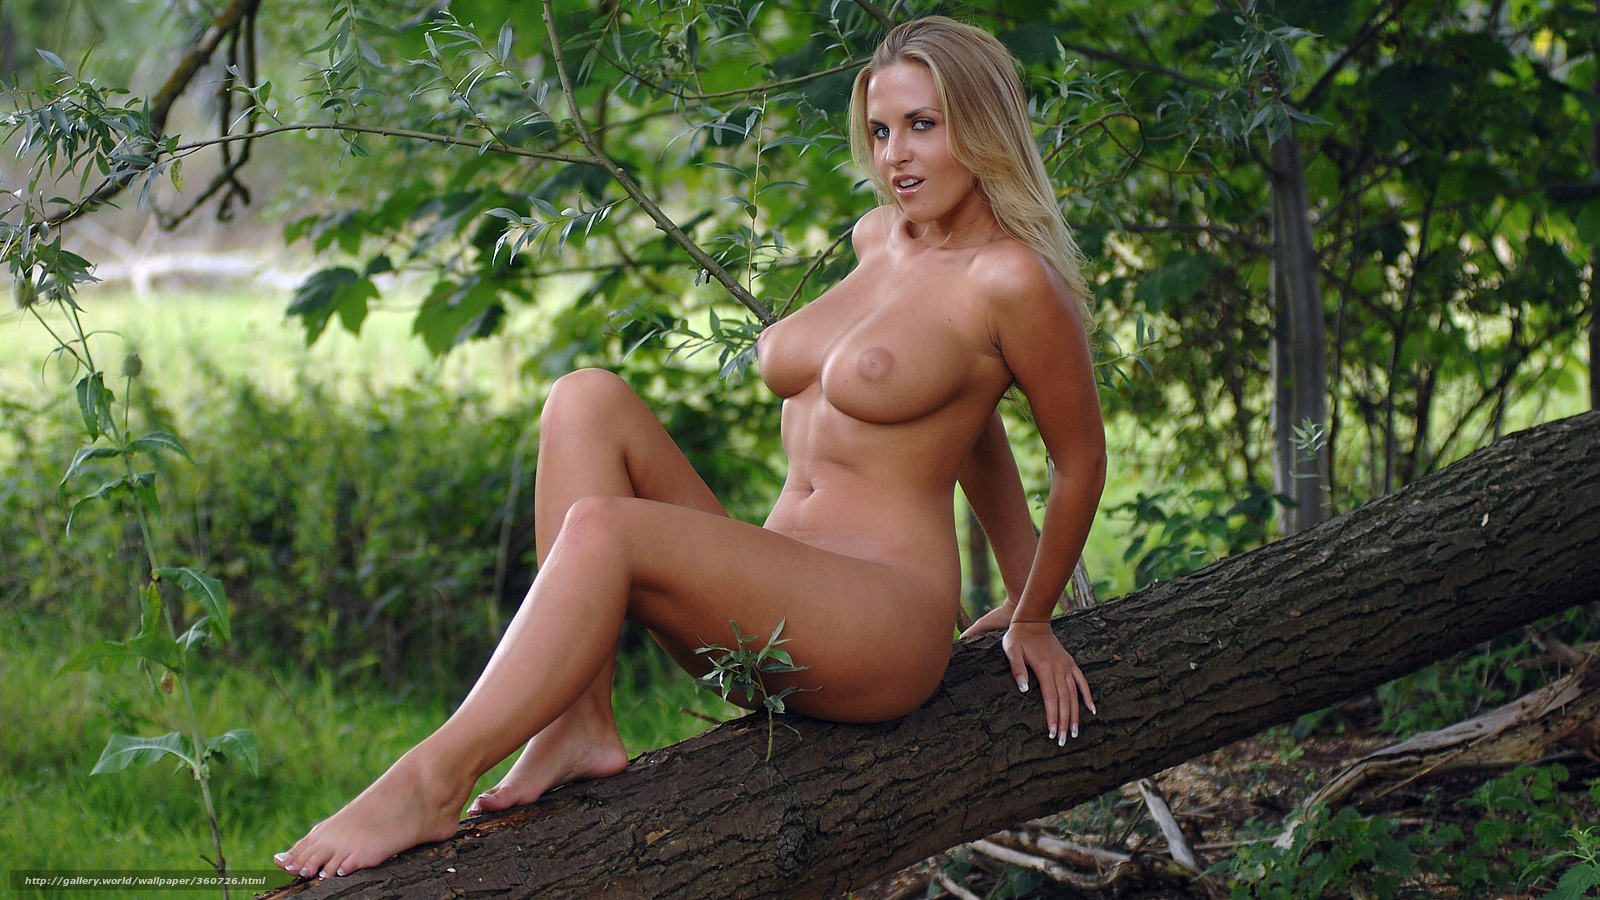 Фото голая девушка hd 2 фотография